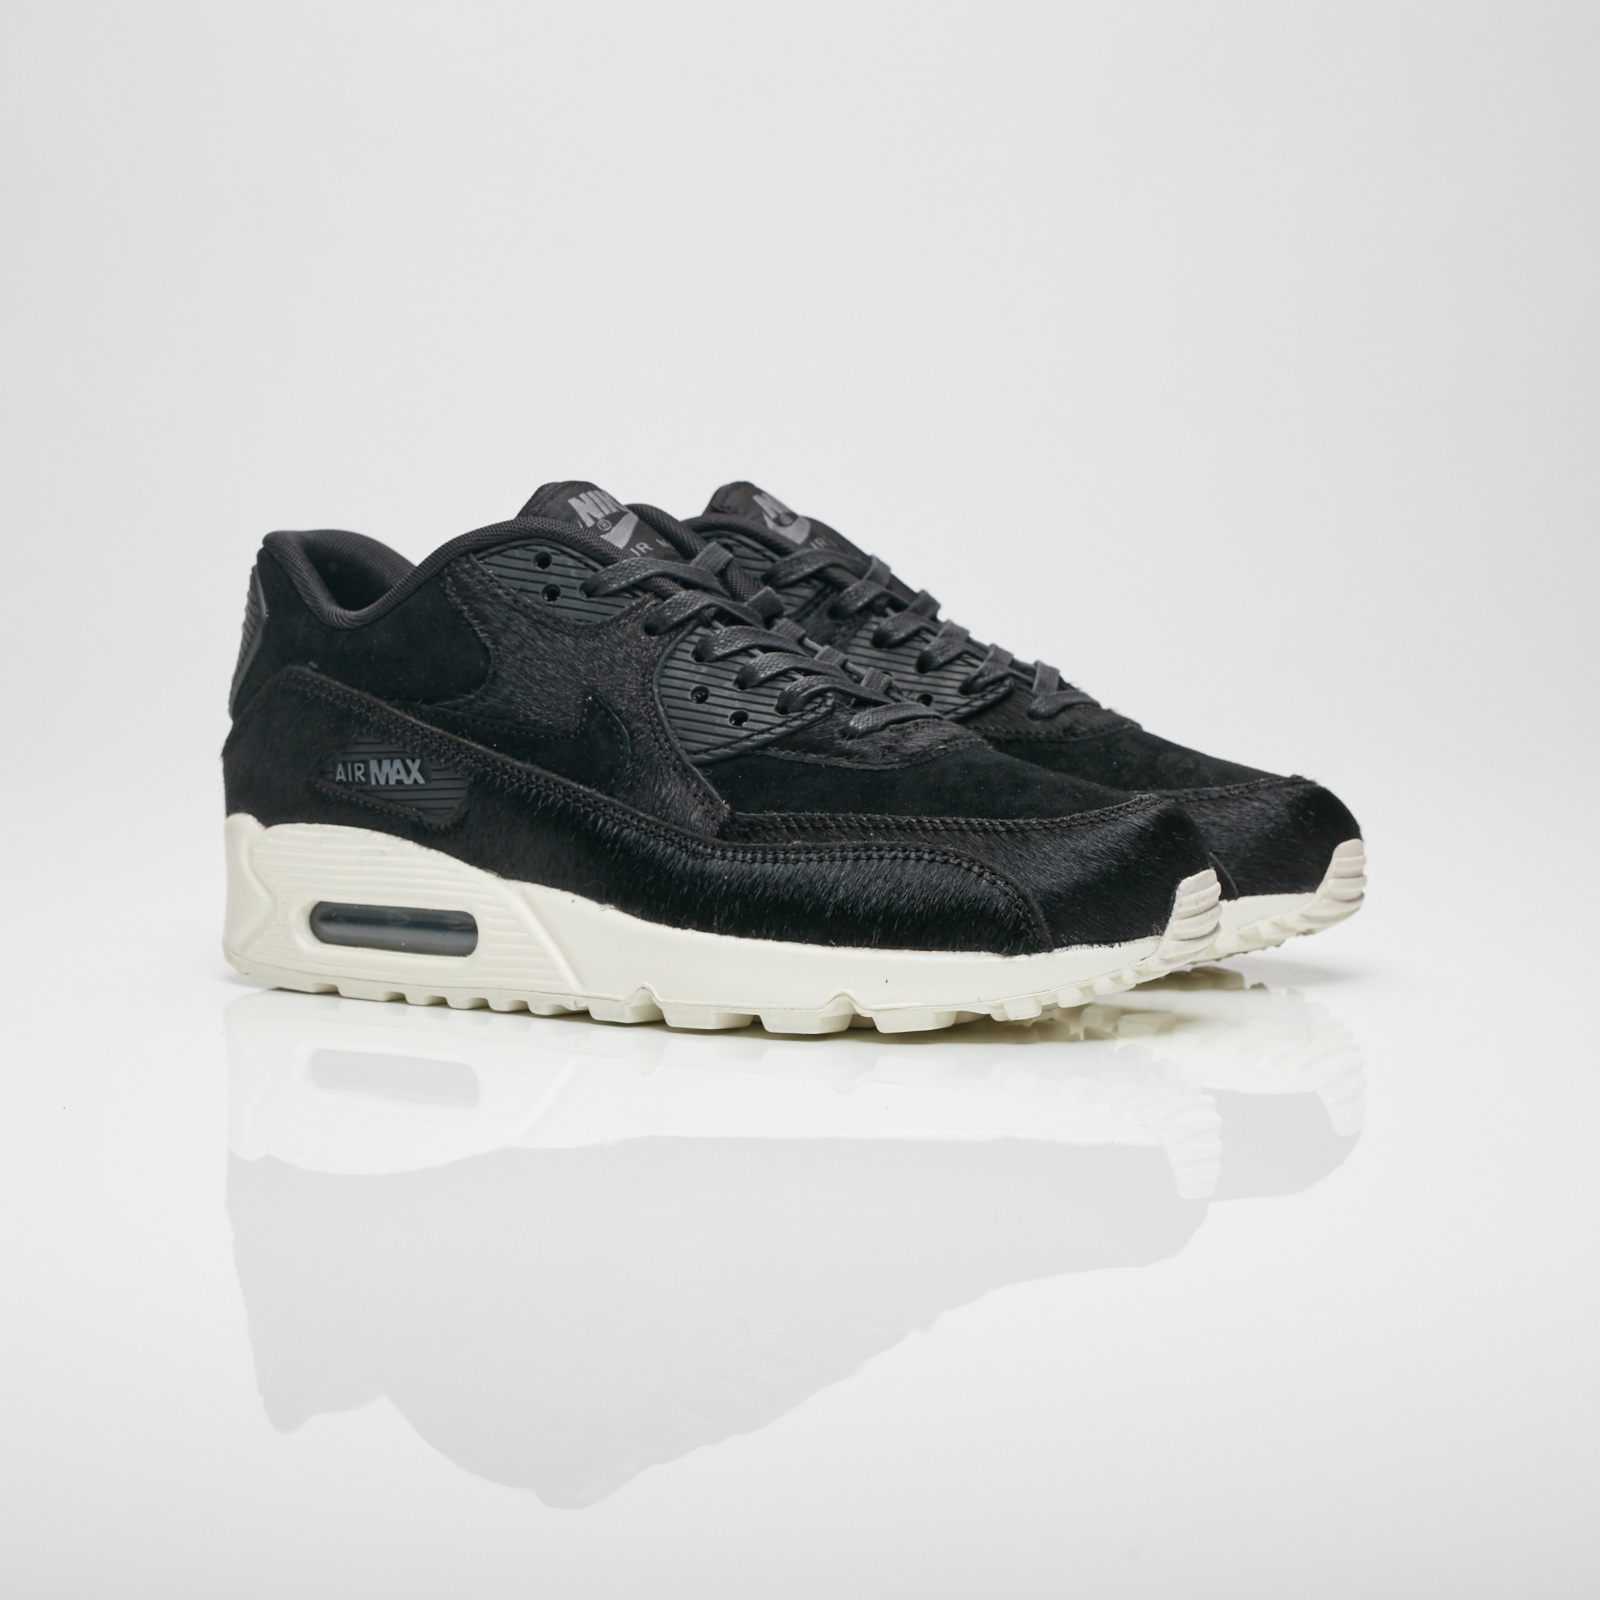 e49b907447 Nike Wmns Air Max 90 LX - 898512-006 - Sneakersnstuff | sneakers ...